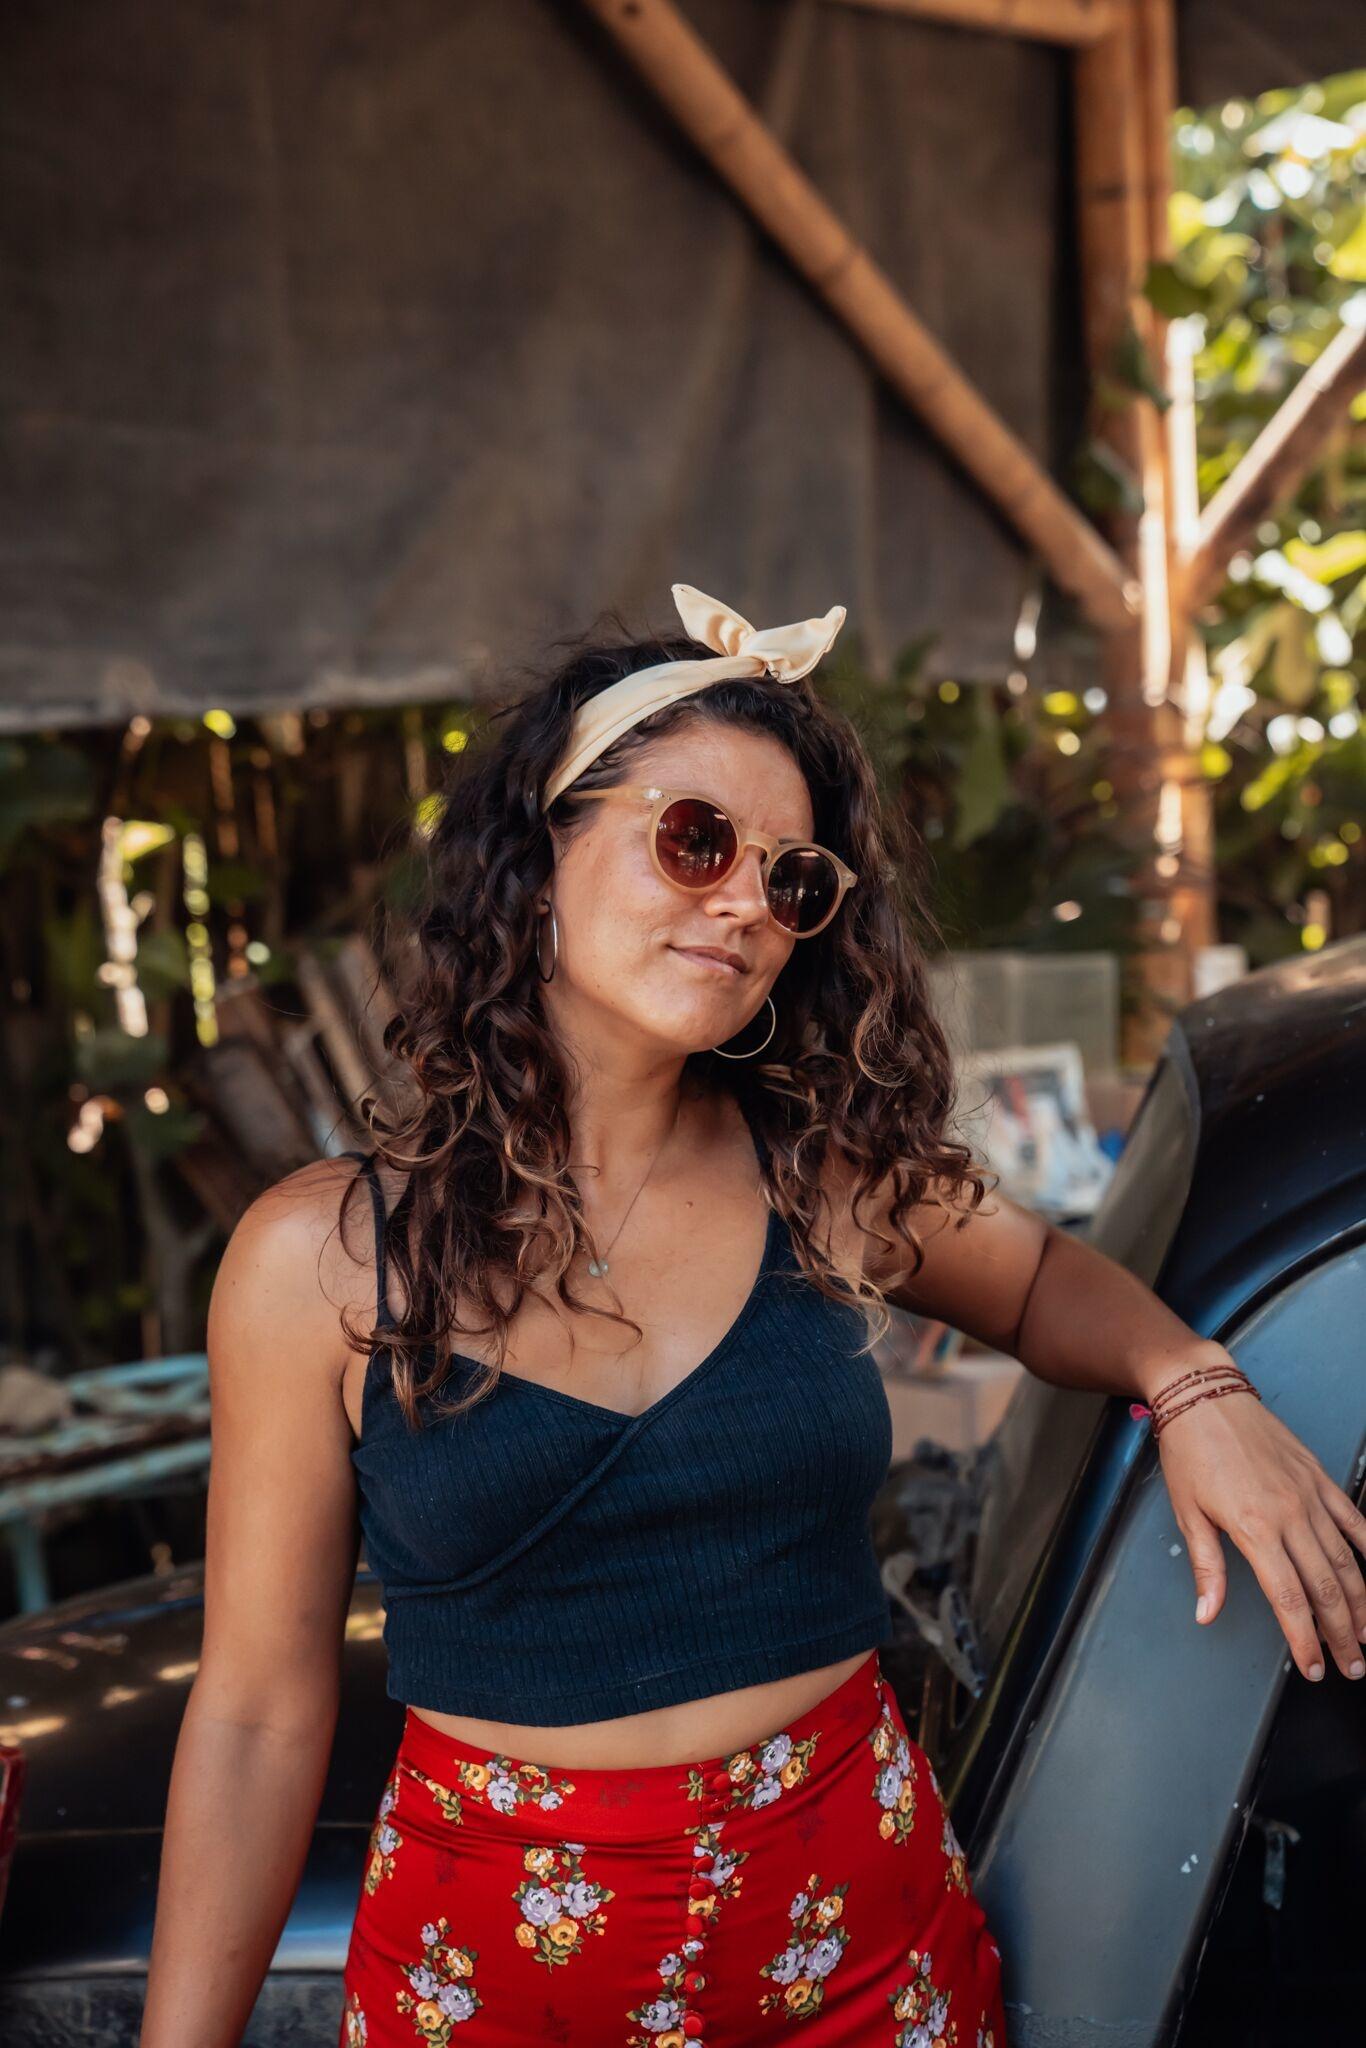 Gibou Satin Twisted Headbands - Color Choices